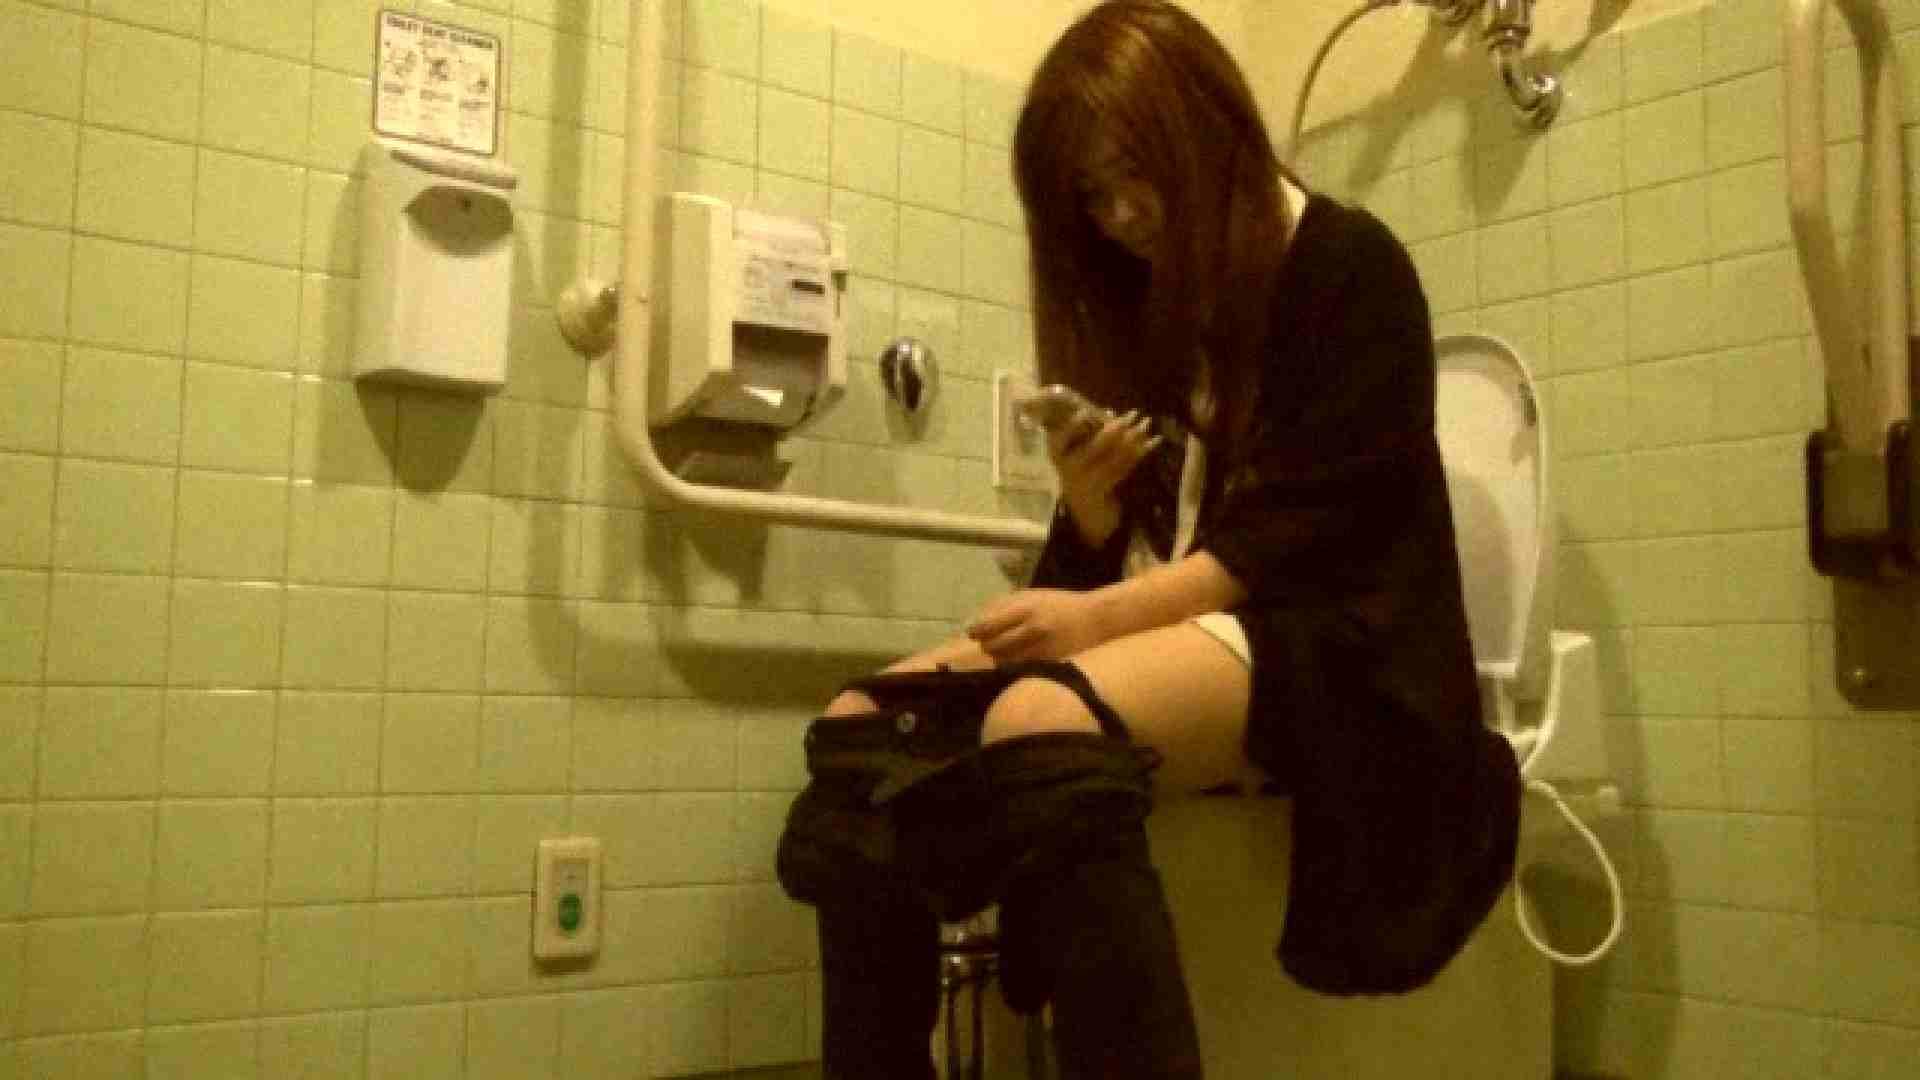 vol.26 【SKちゃん(洗面所)】ガールズバー店員 19歳 キャバ嬢  50連発 35